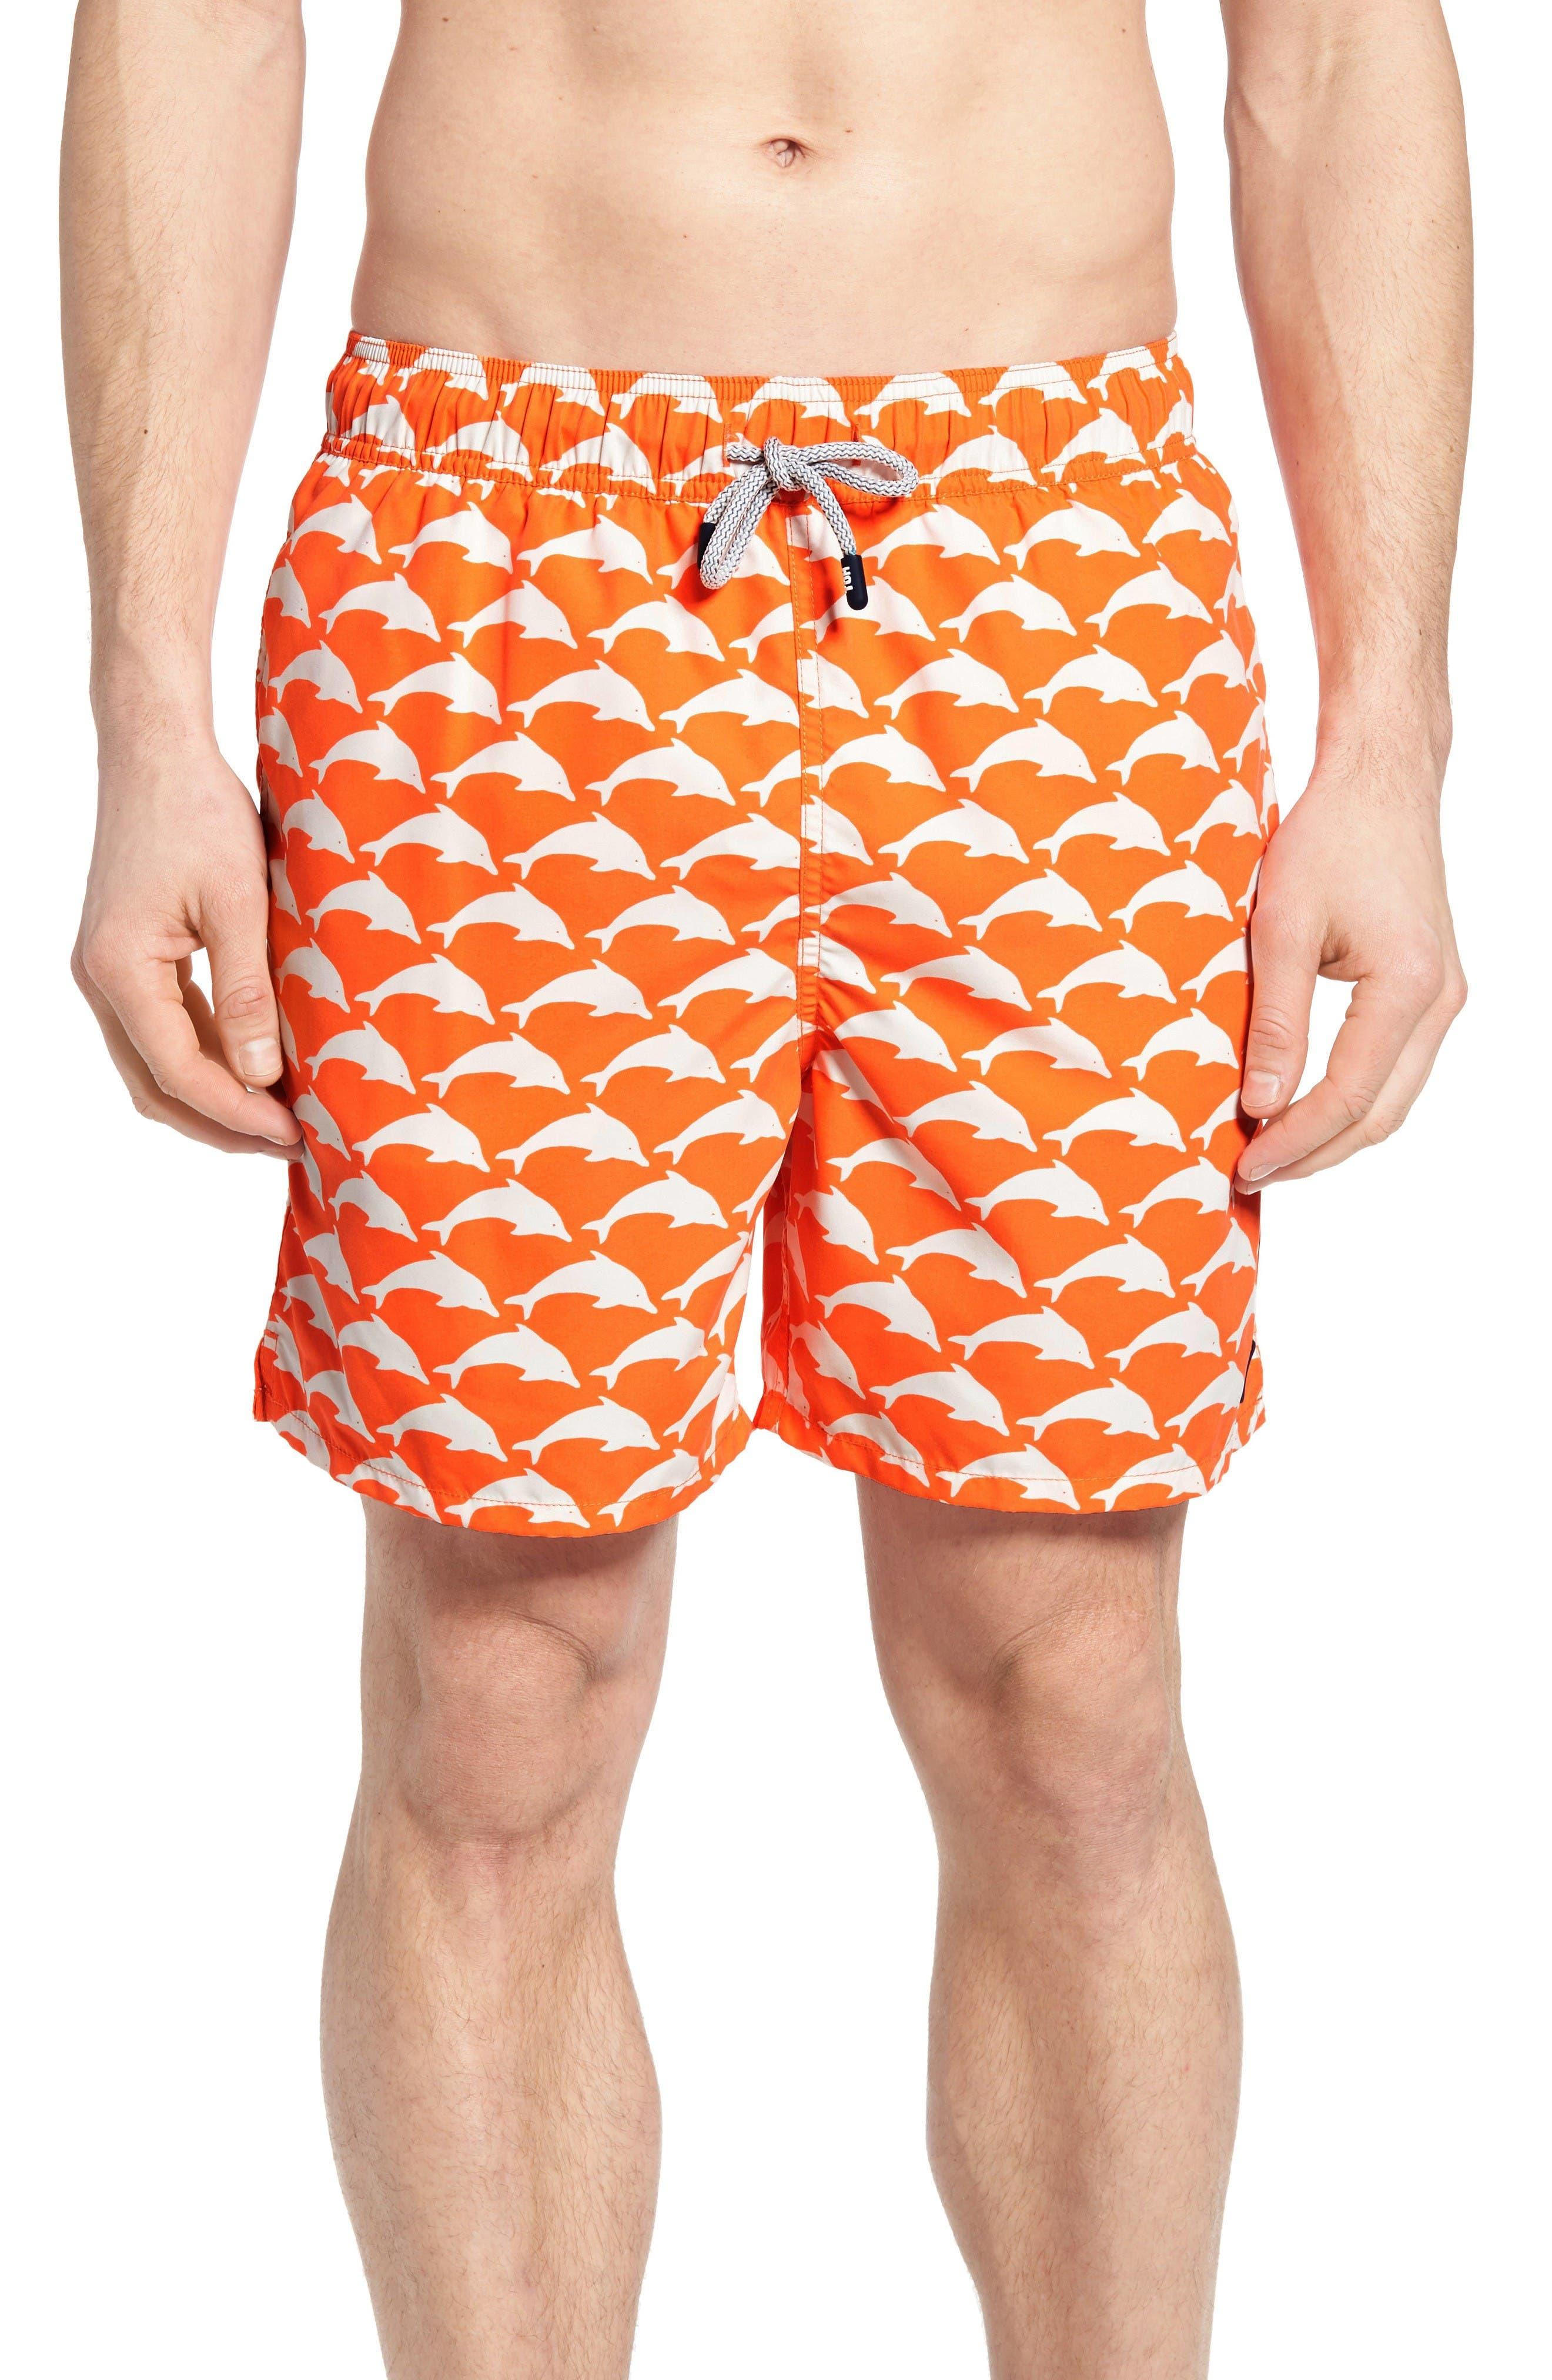 Dolphin Print Swim Trunks,                         Main,                         color, Orange White